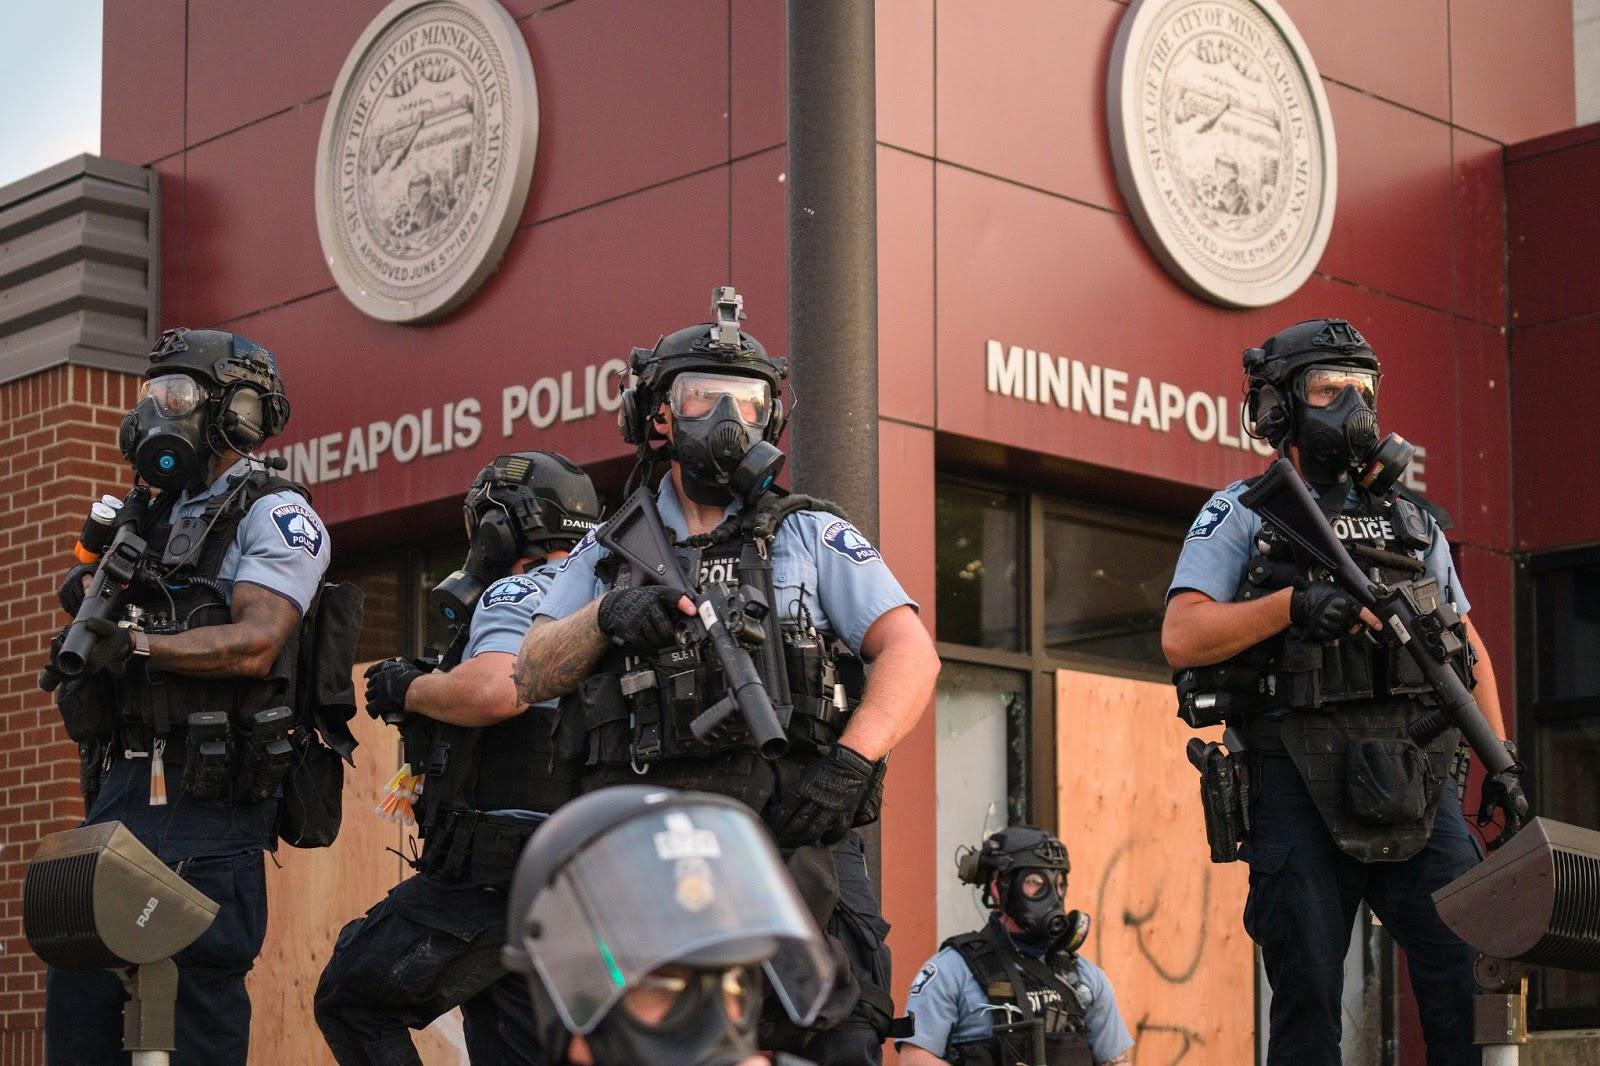 Minneapolis Police Department, Third Precinct